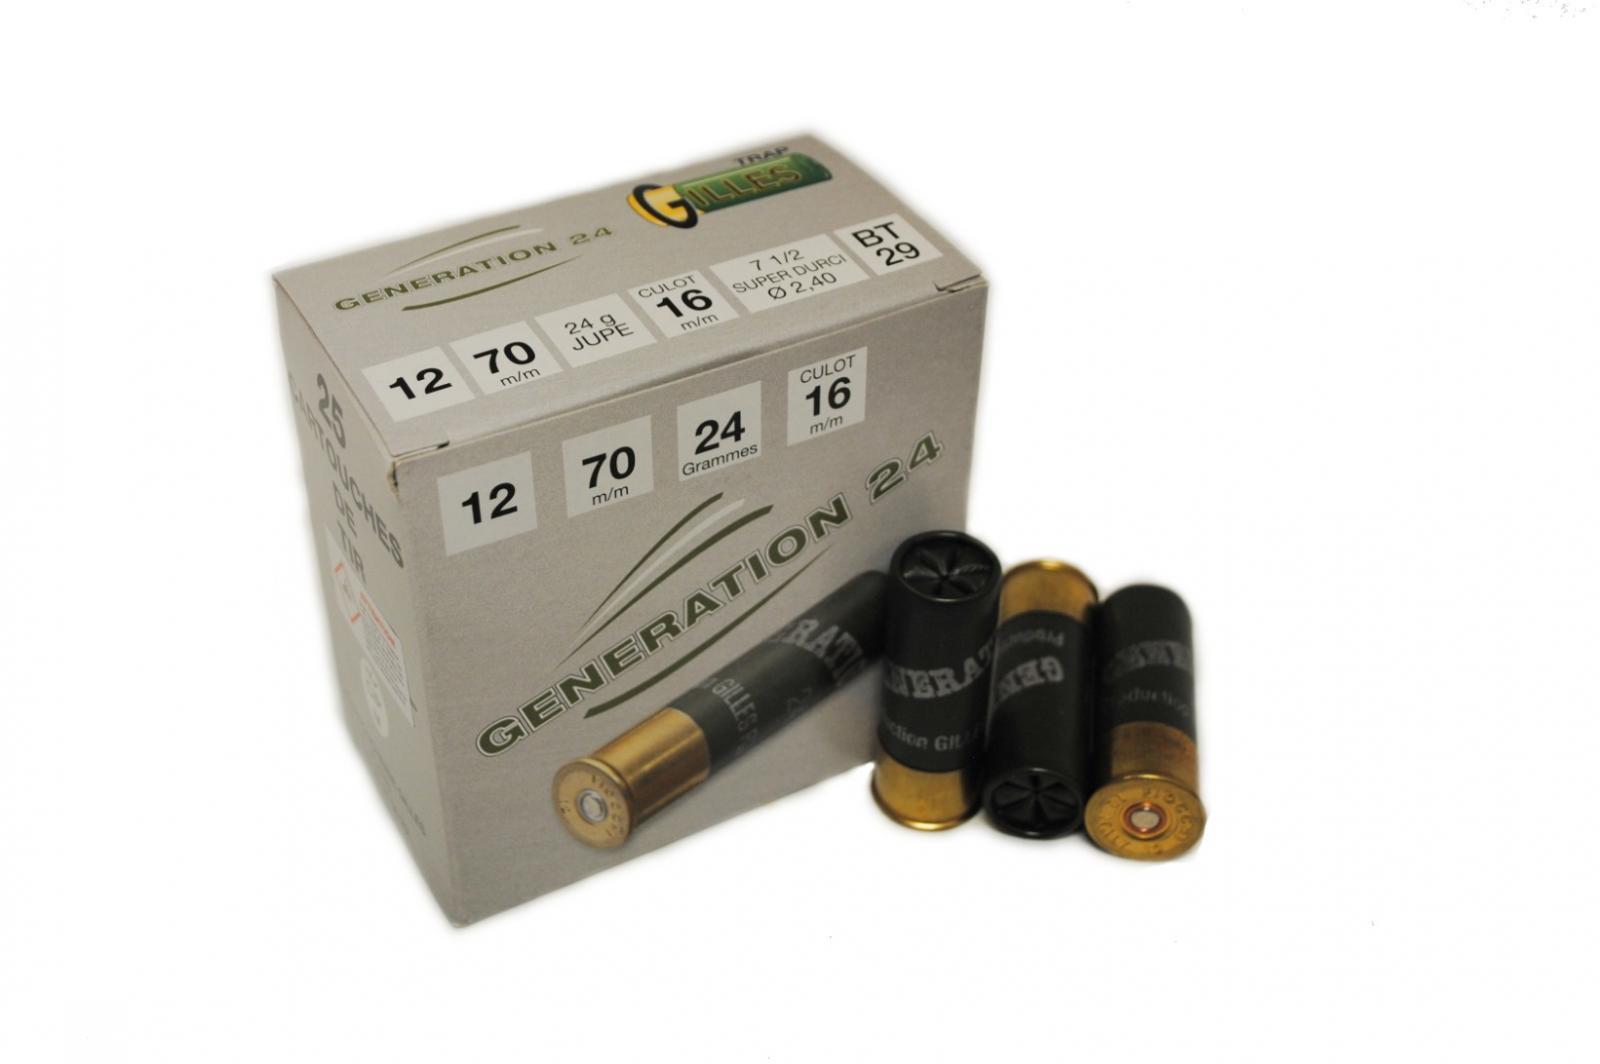 Boite de 25 cartouches GENERATION 24 SUPER DURCI cal 12 BT29